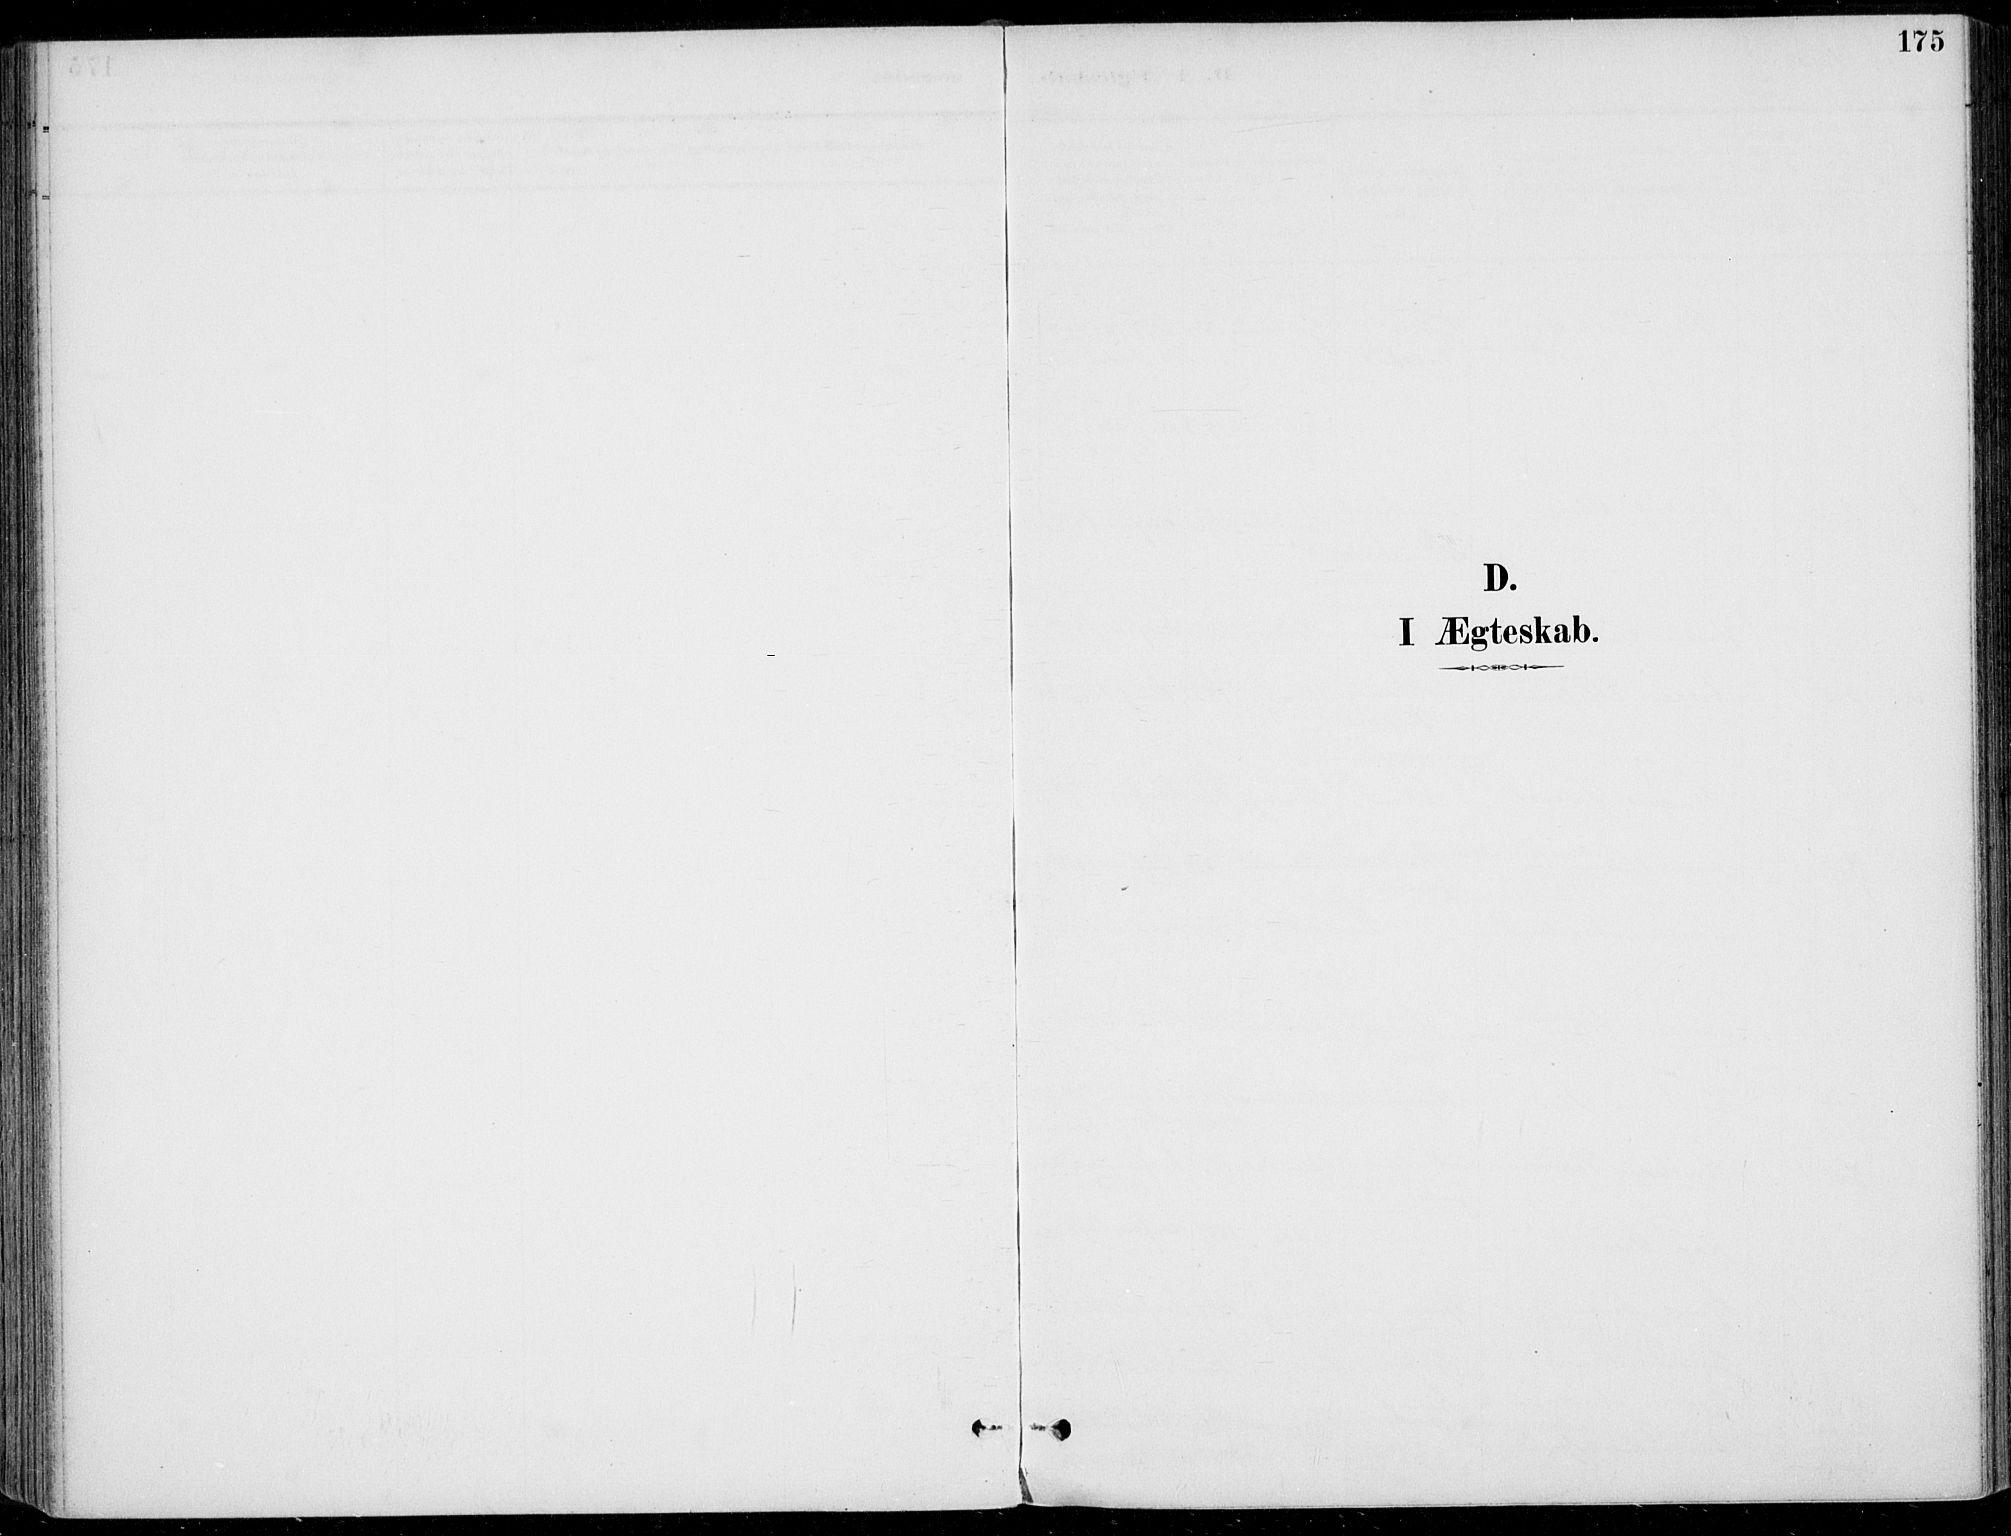 SAKO, Sigdal kirkebøker, F/Fb/L0001: Ministerialbok nr. II 1, 1888-1900, s. 175